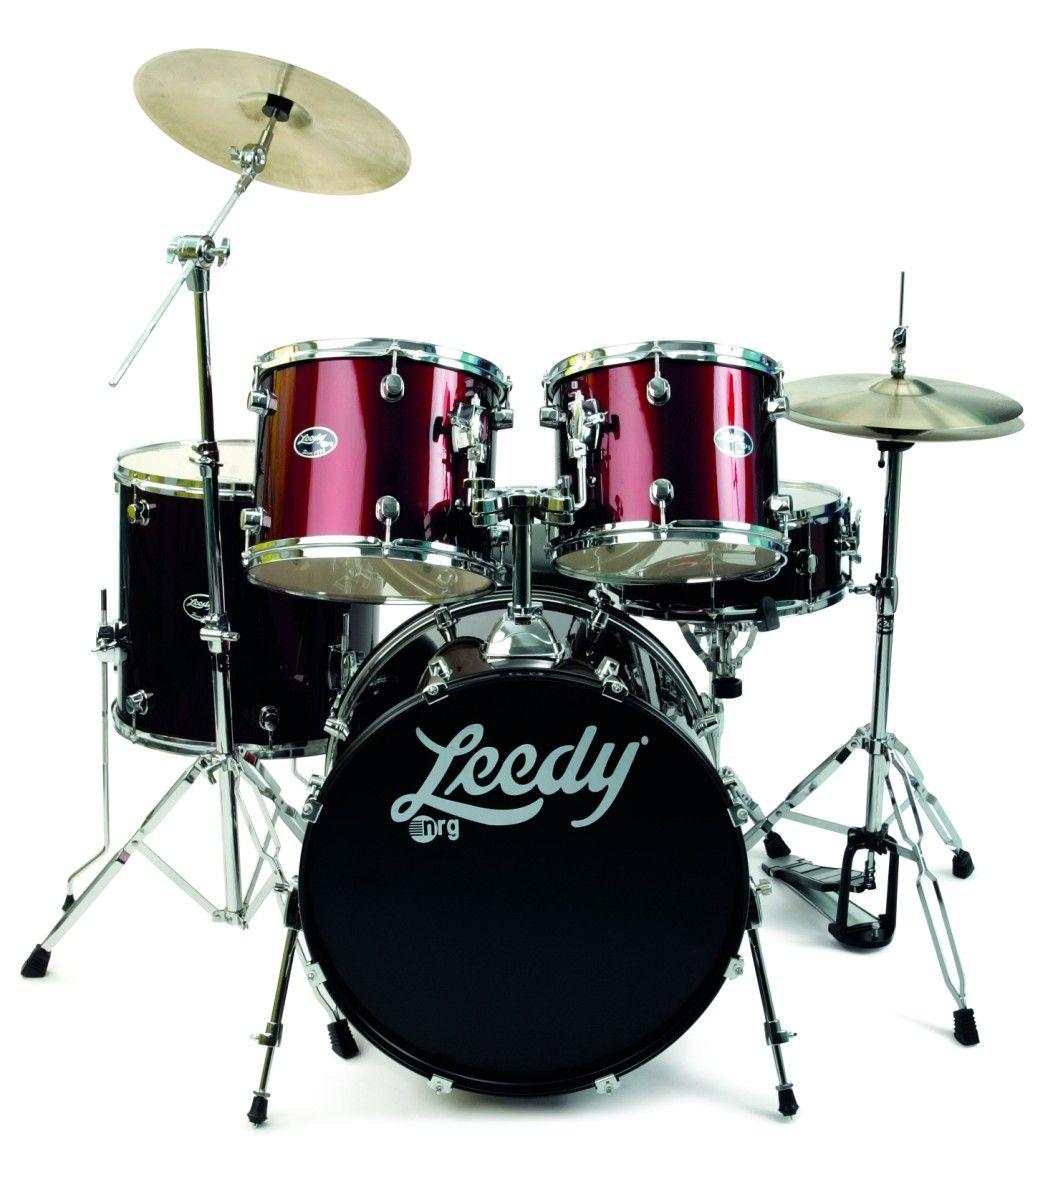 Leedy Drums Nrg Rock Kit Review Musicradar